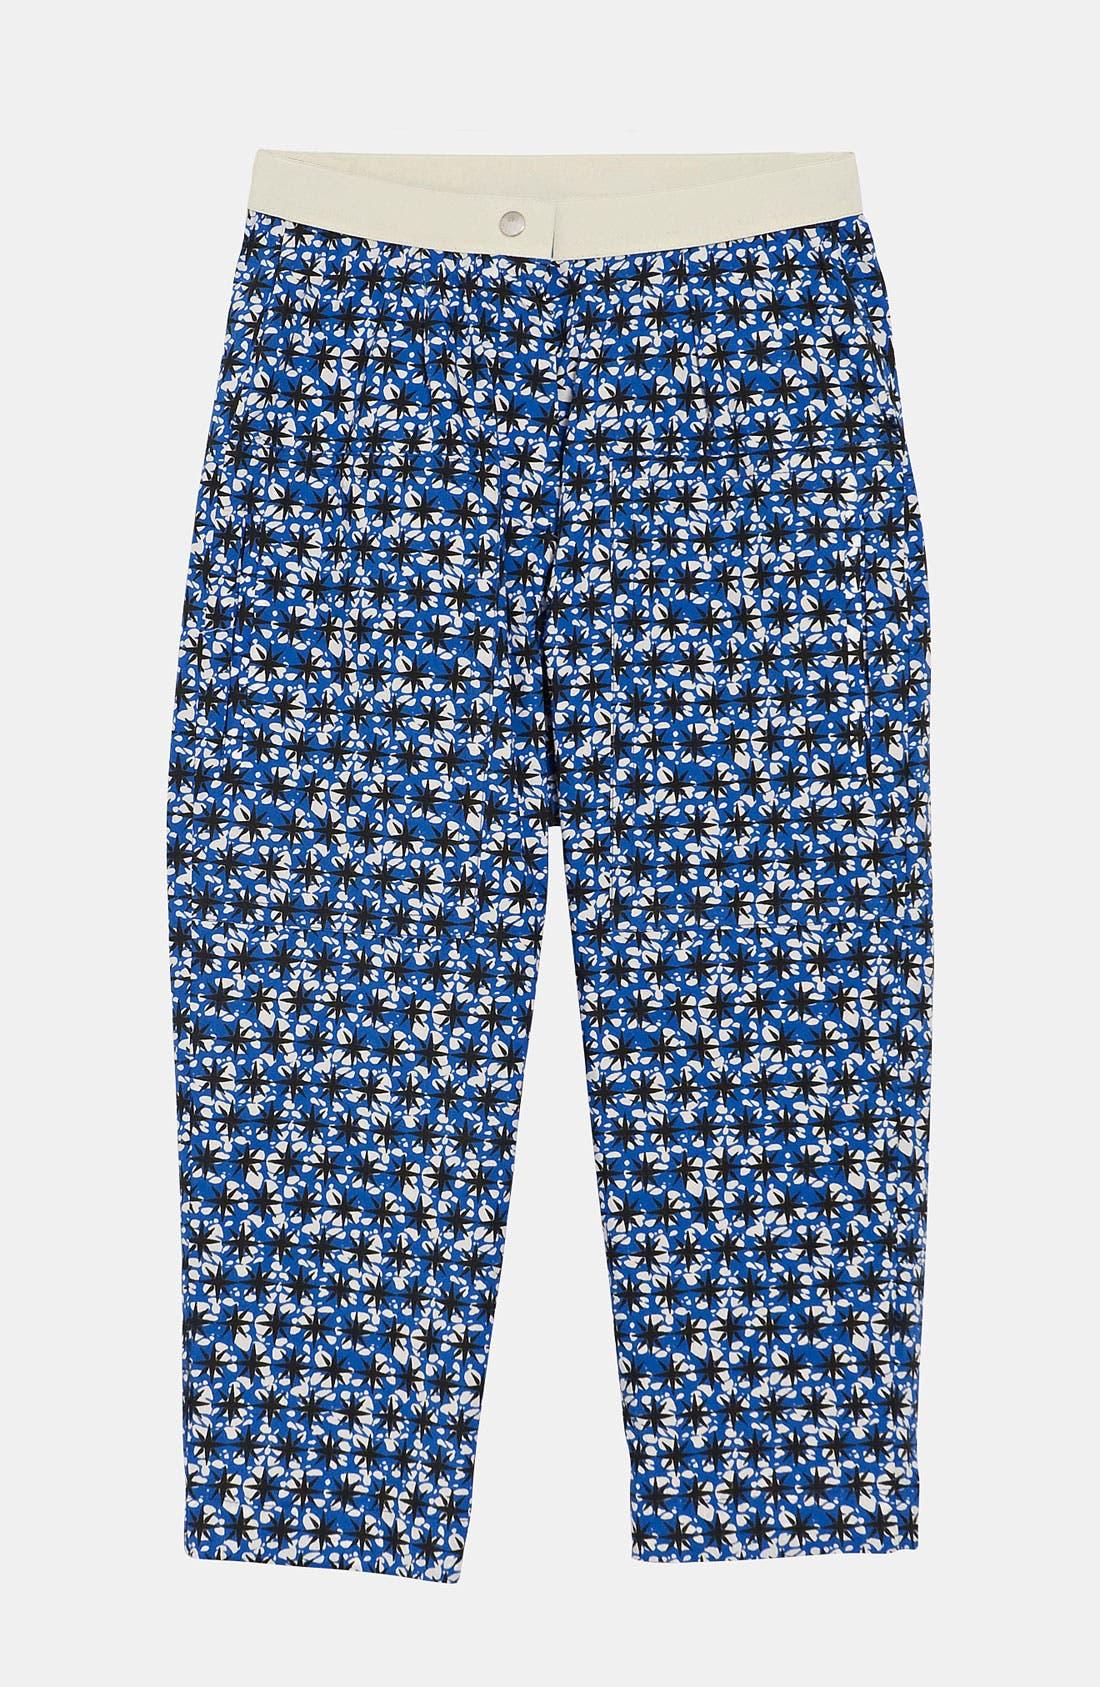 Alternate Image 1 Selected - Marni Star Print Trousers (Little Girls & Big Girls)